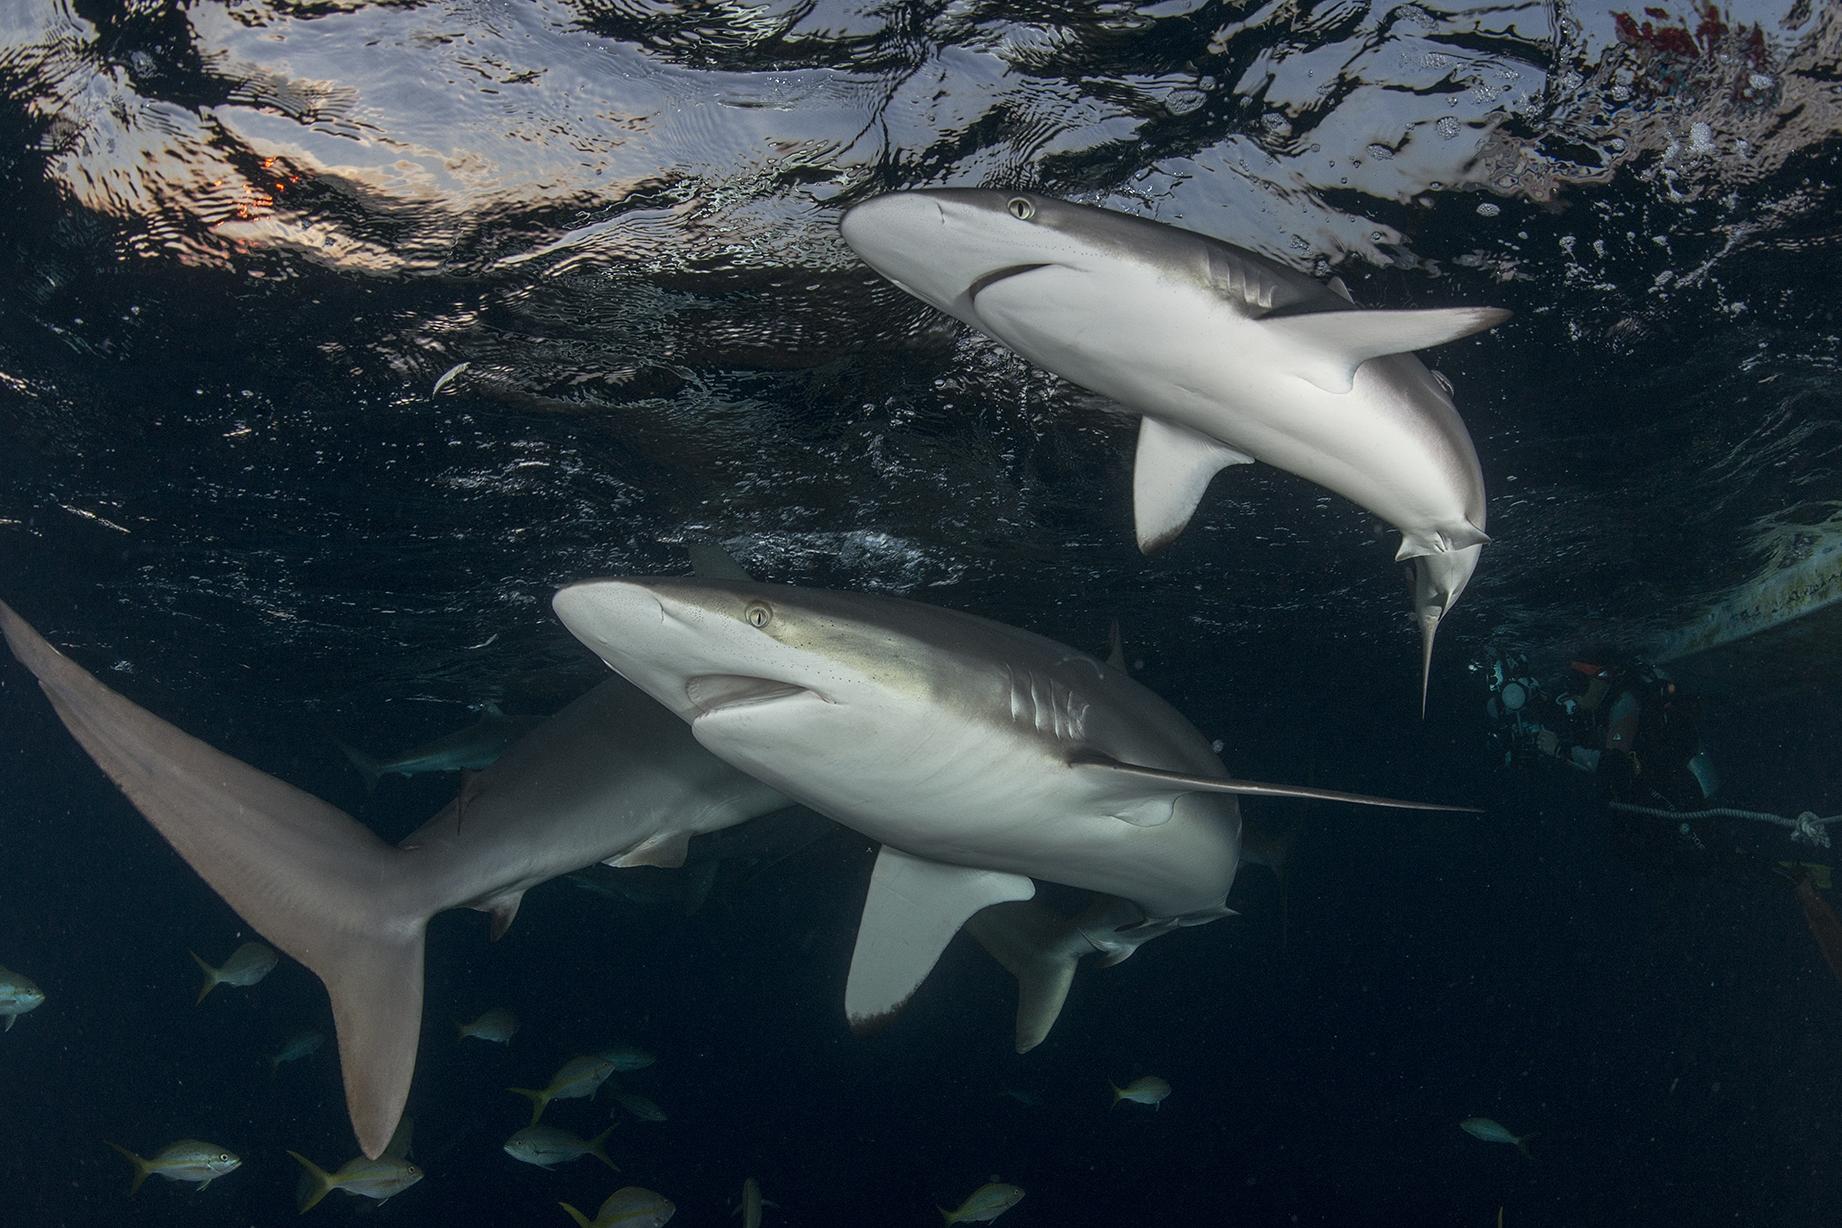 SILKY SHARKS IN CUBA AT NIGHT CREDIT: Jayne JENKINS / coral reef image bank